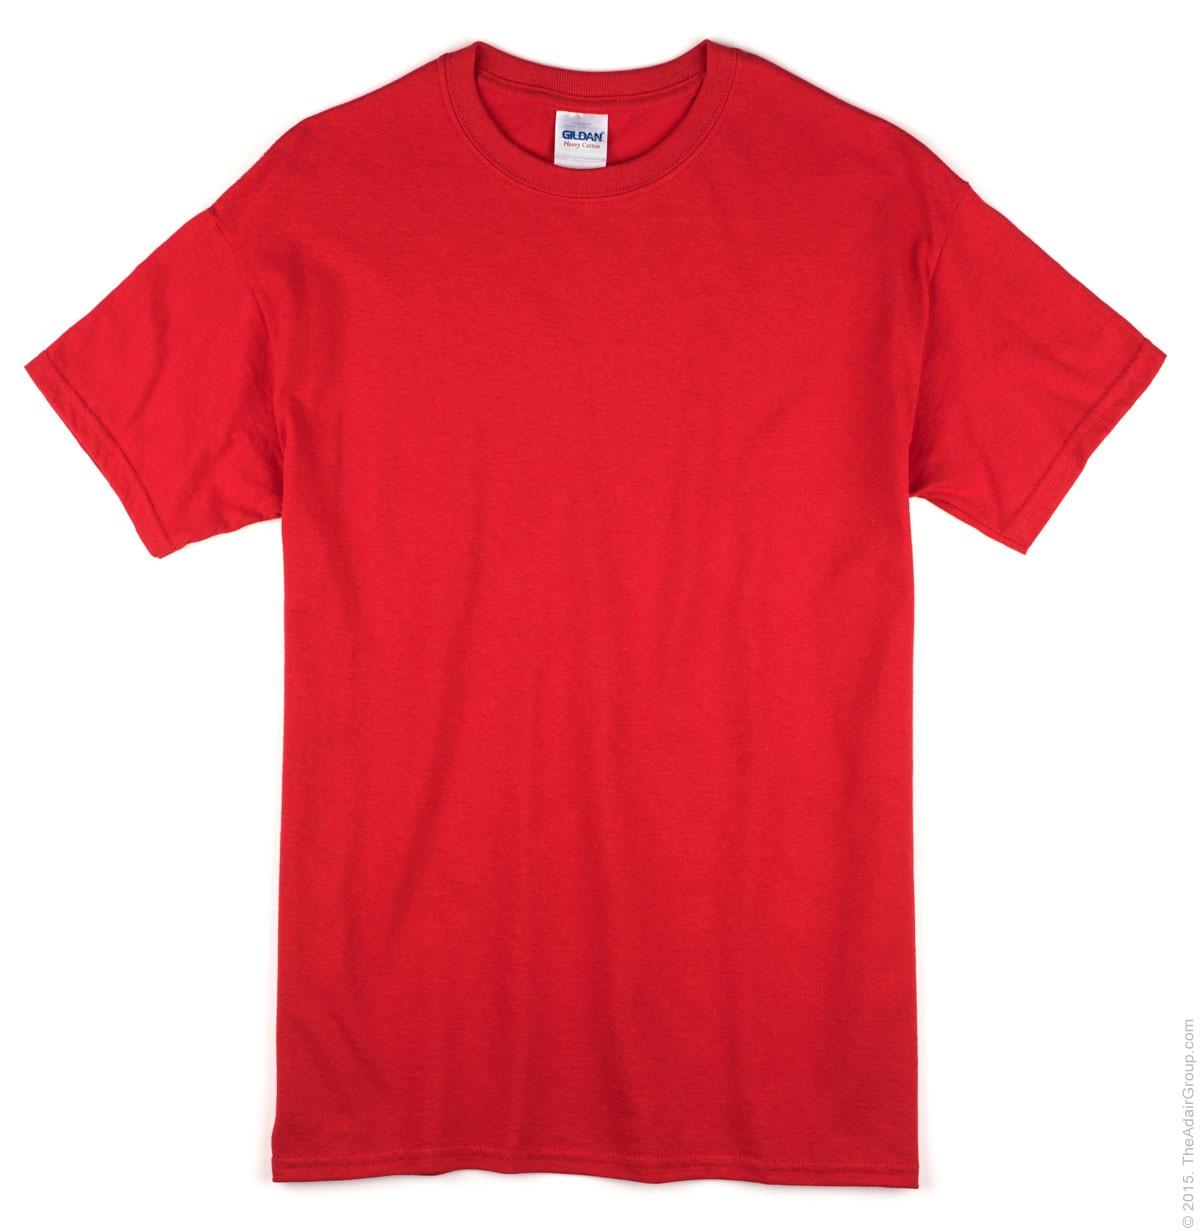 Red Blank T-shirt - Basic tees shop